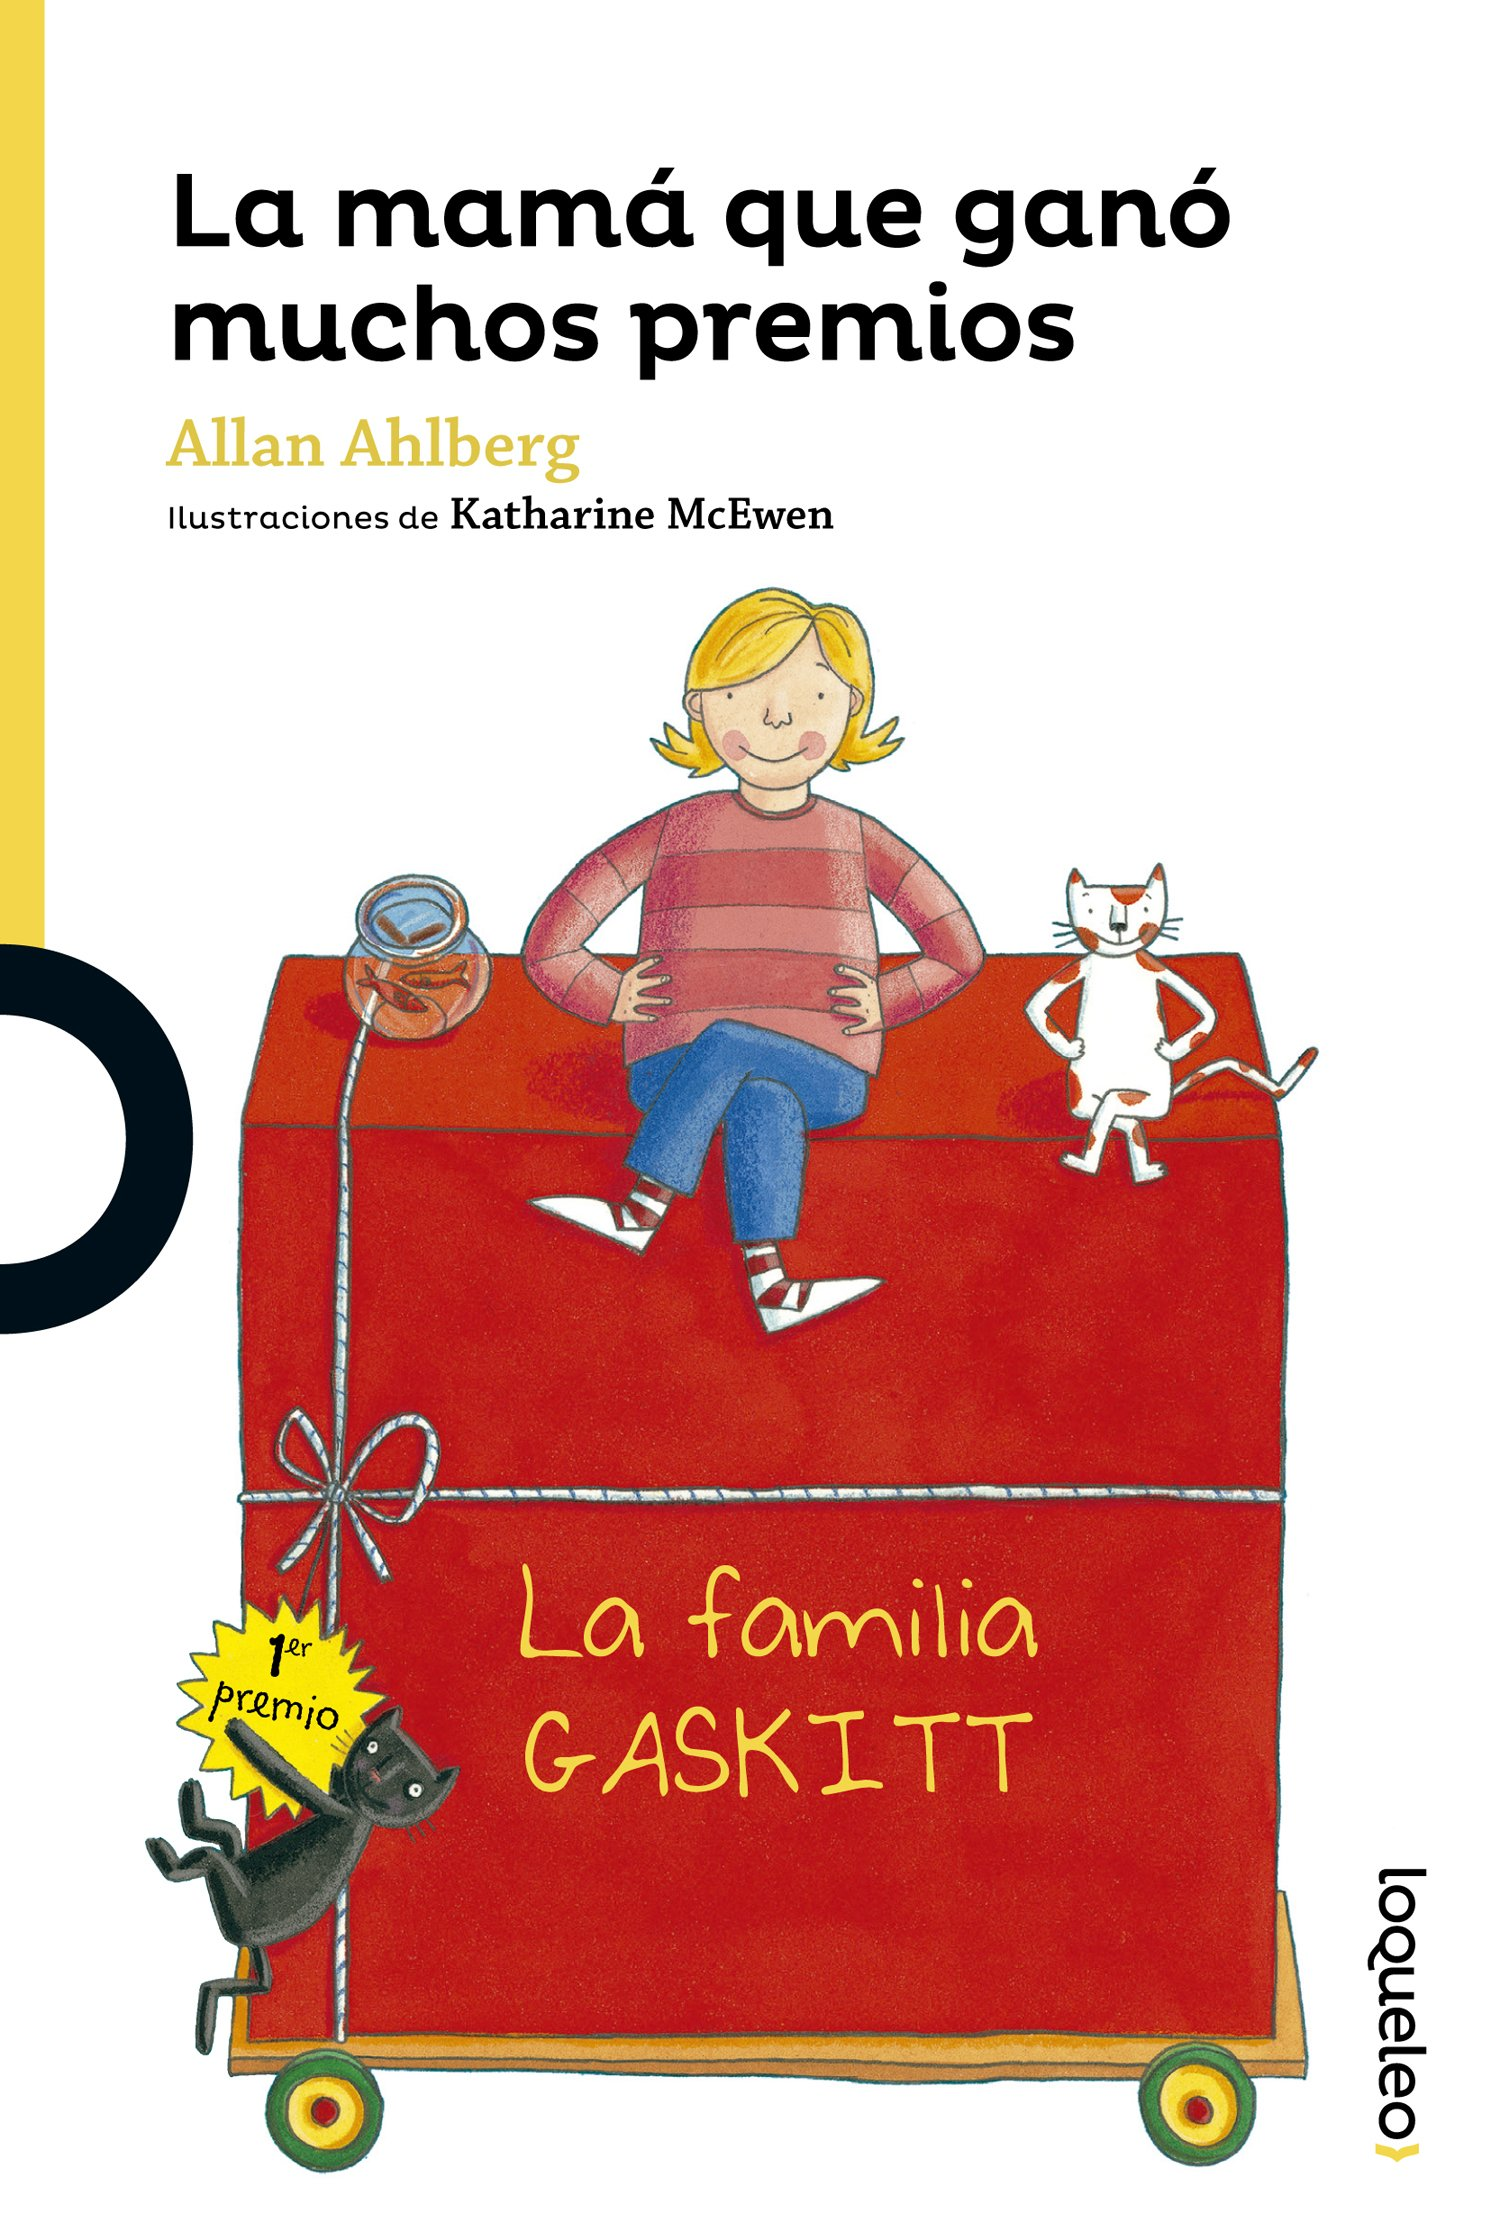 La mamá que ganó muchos premios (Spanish) Paperback – January 1, 2016